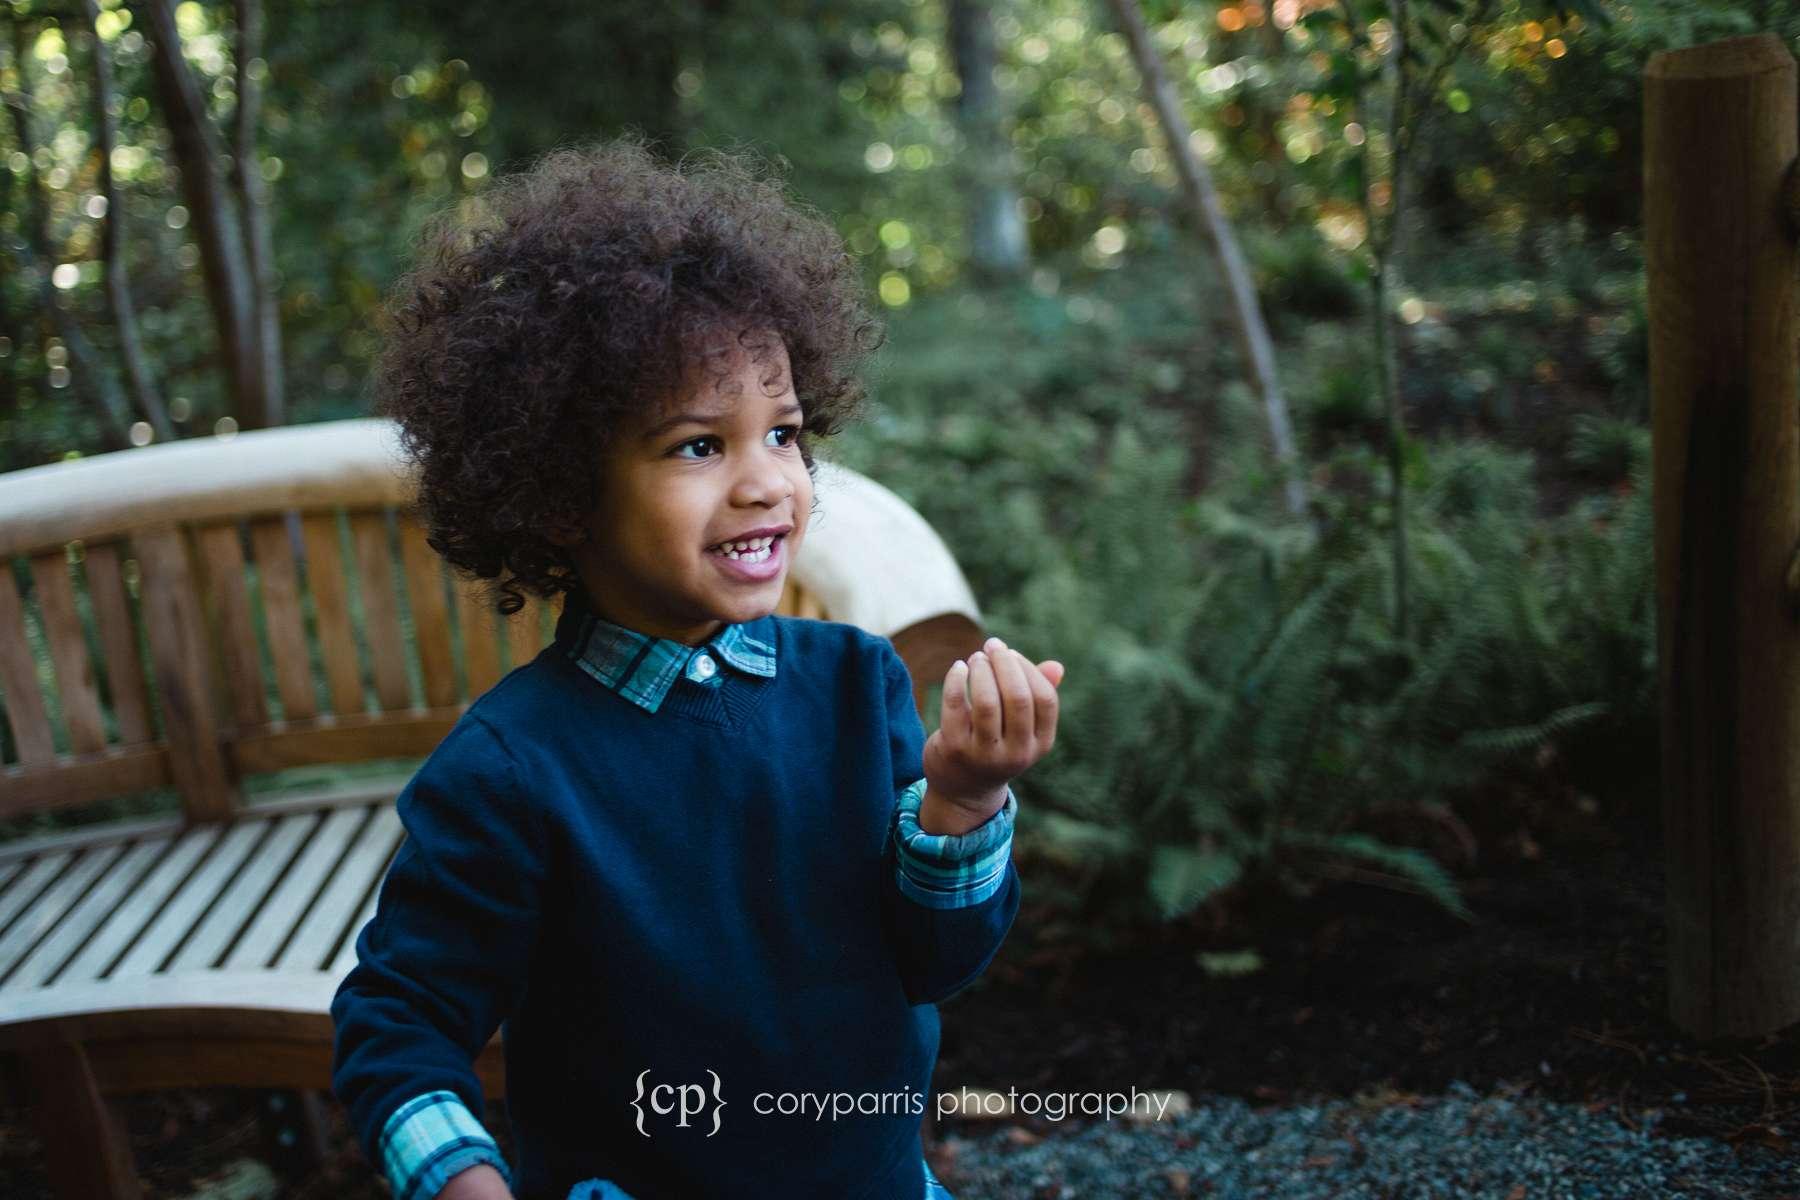 Bellevue kids portrait photography